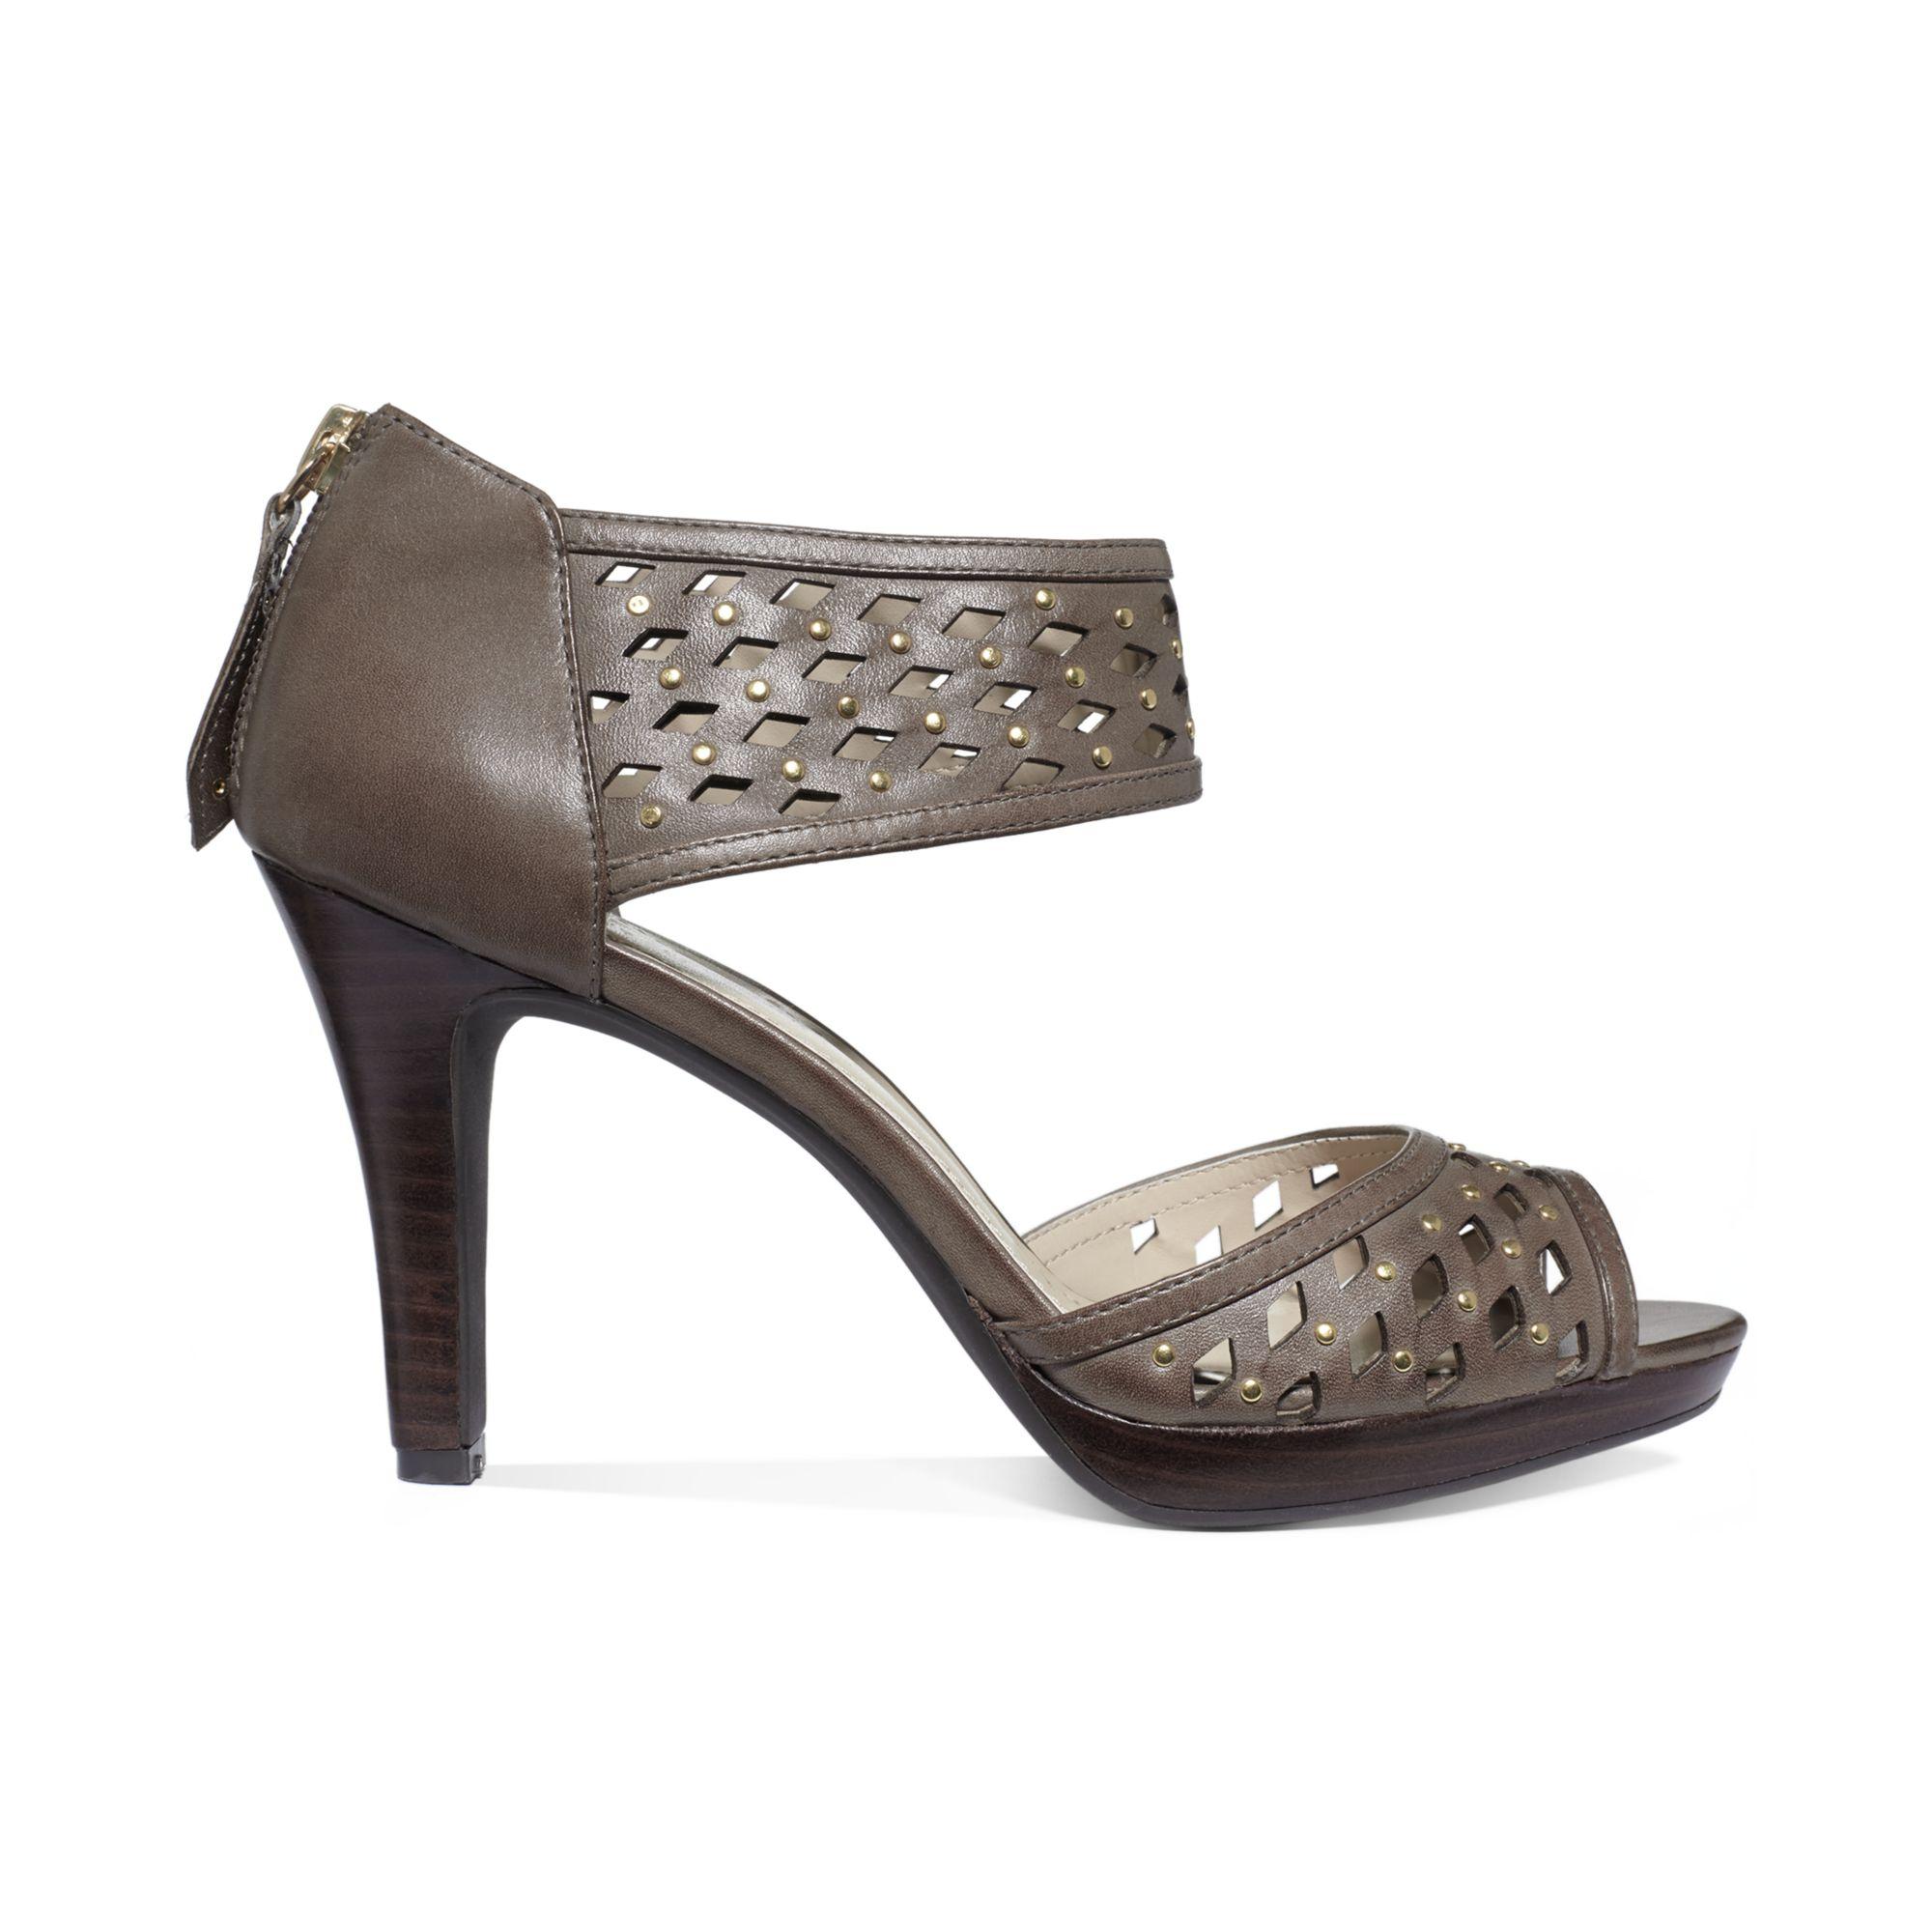 Adrienne Vittadini Shoes Womens